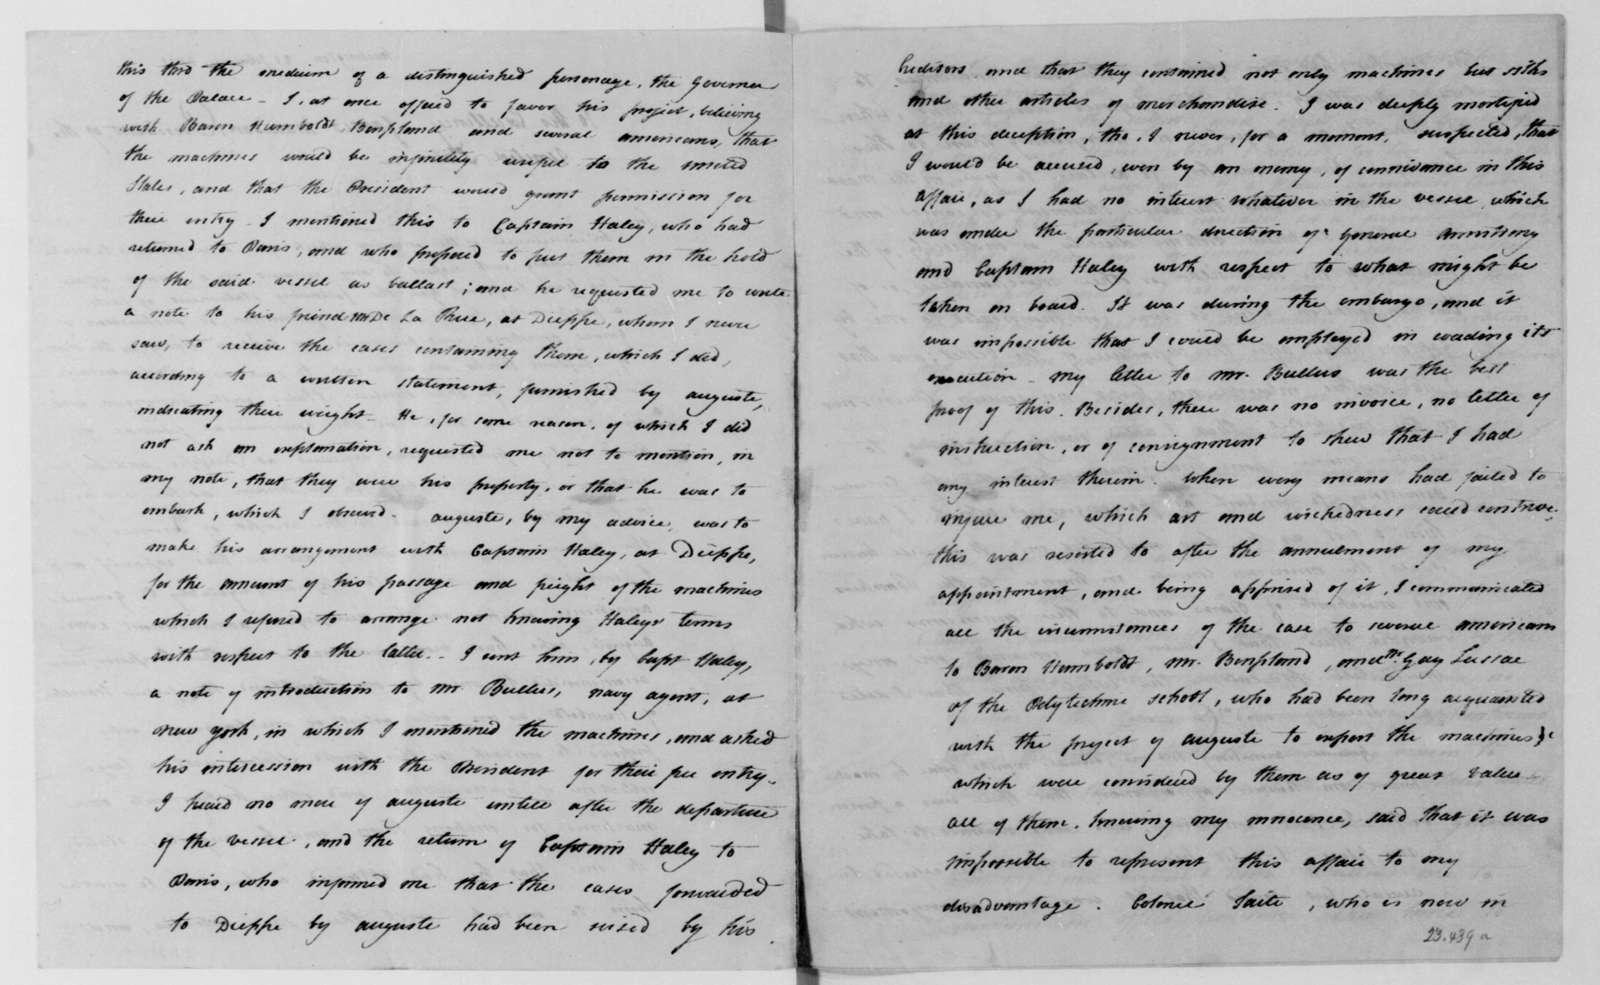 David Bailie Warden to James Madison, February 21, 1811.